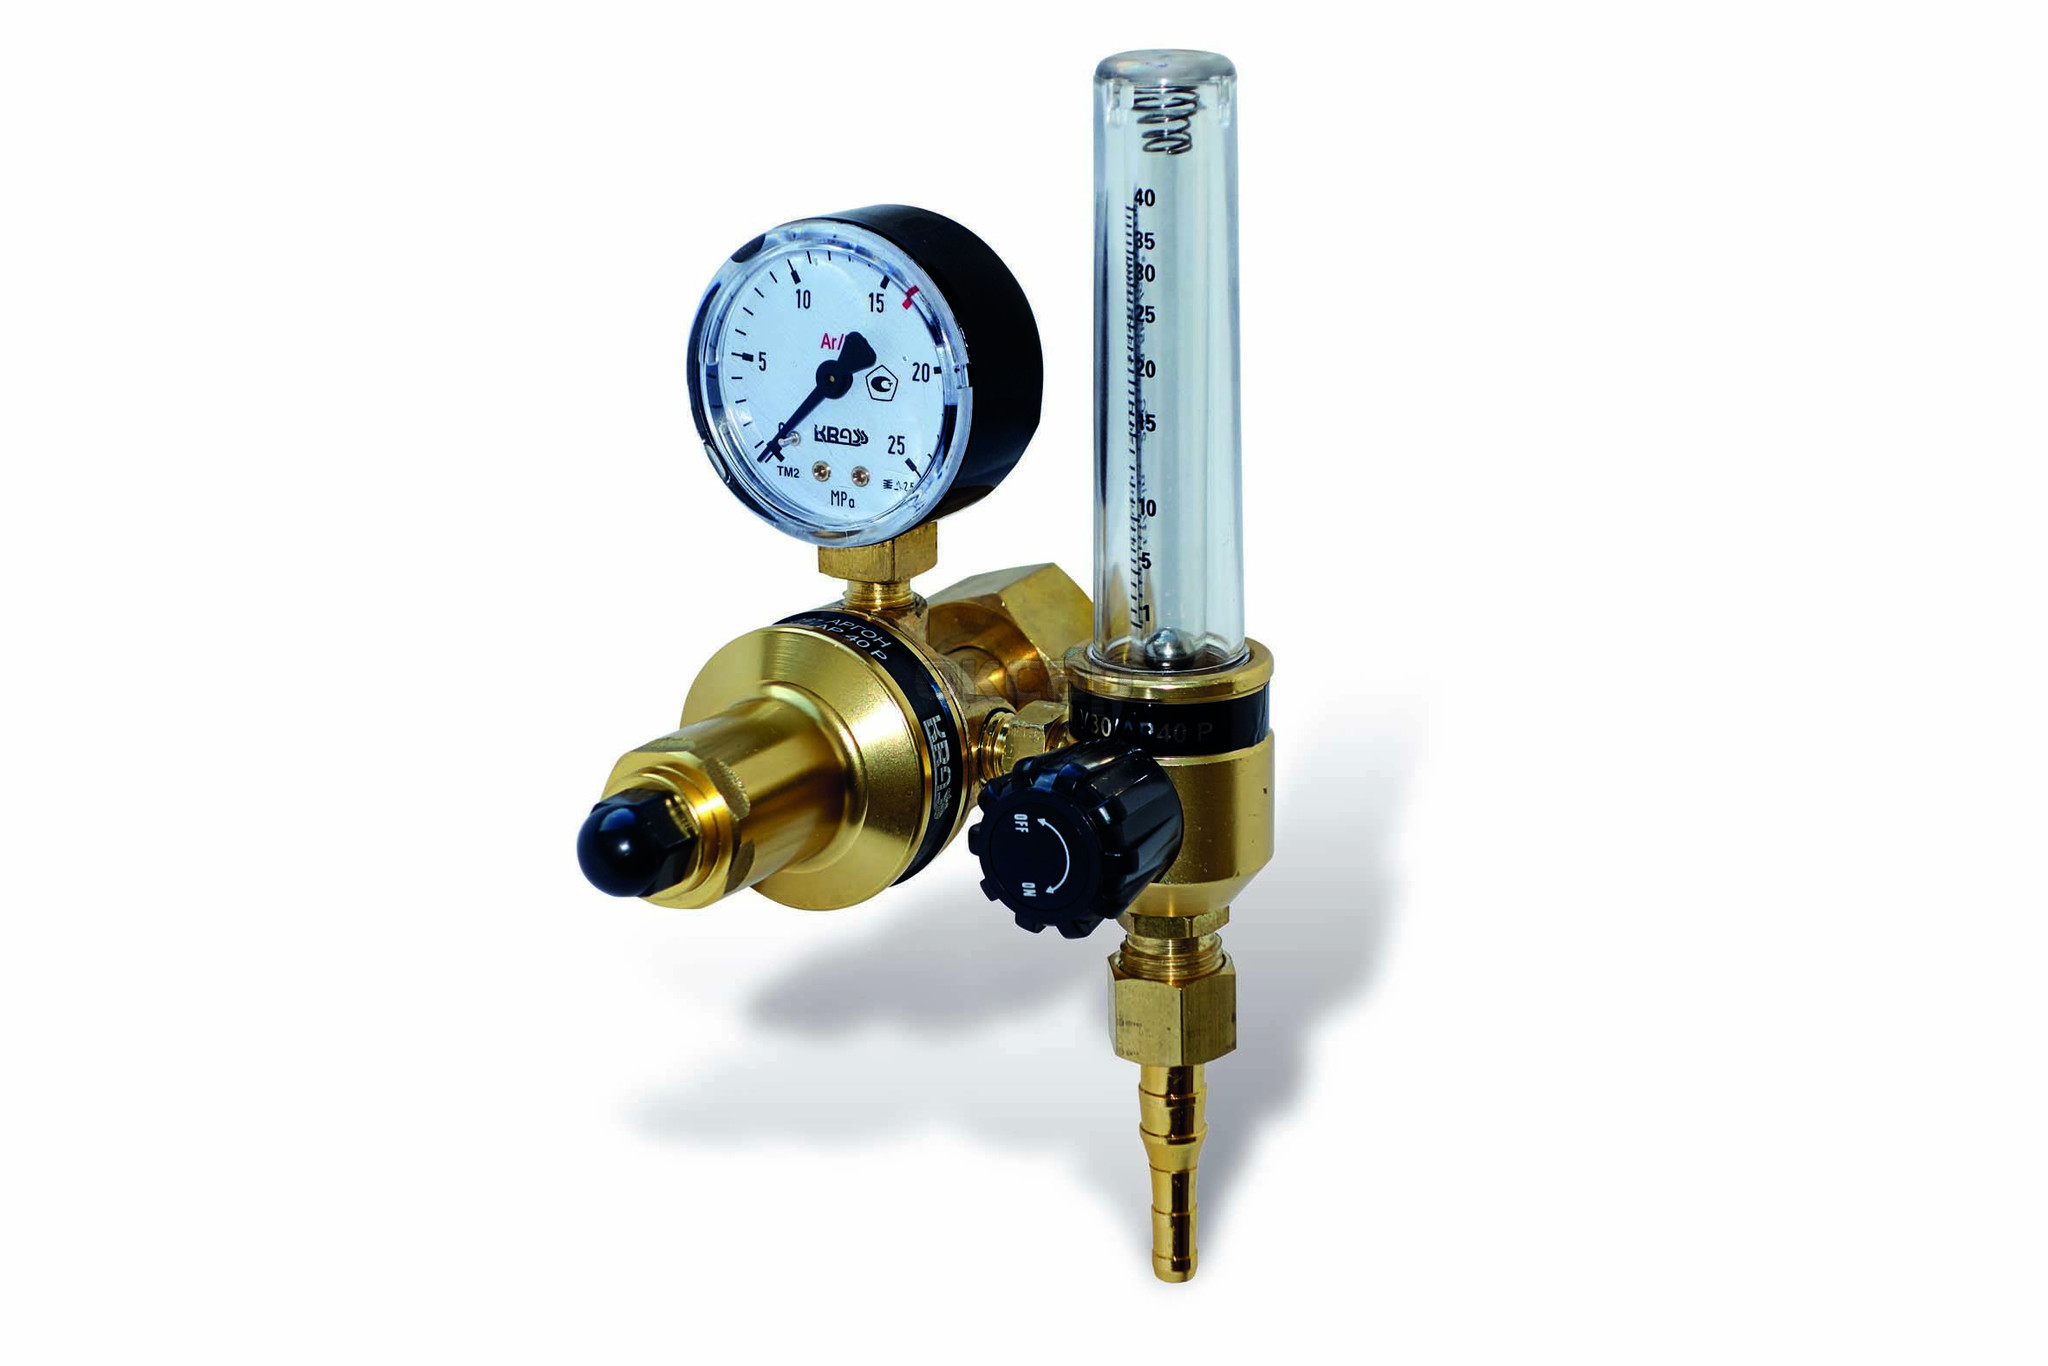 Регулятор Krass У 30/АР 40 Р с ротаметром регулятор давления топлива спорт ауди 100 2 3 е